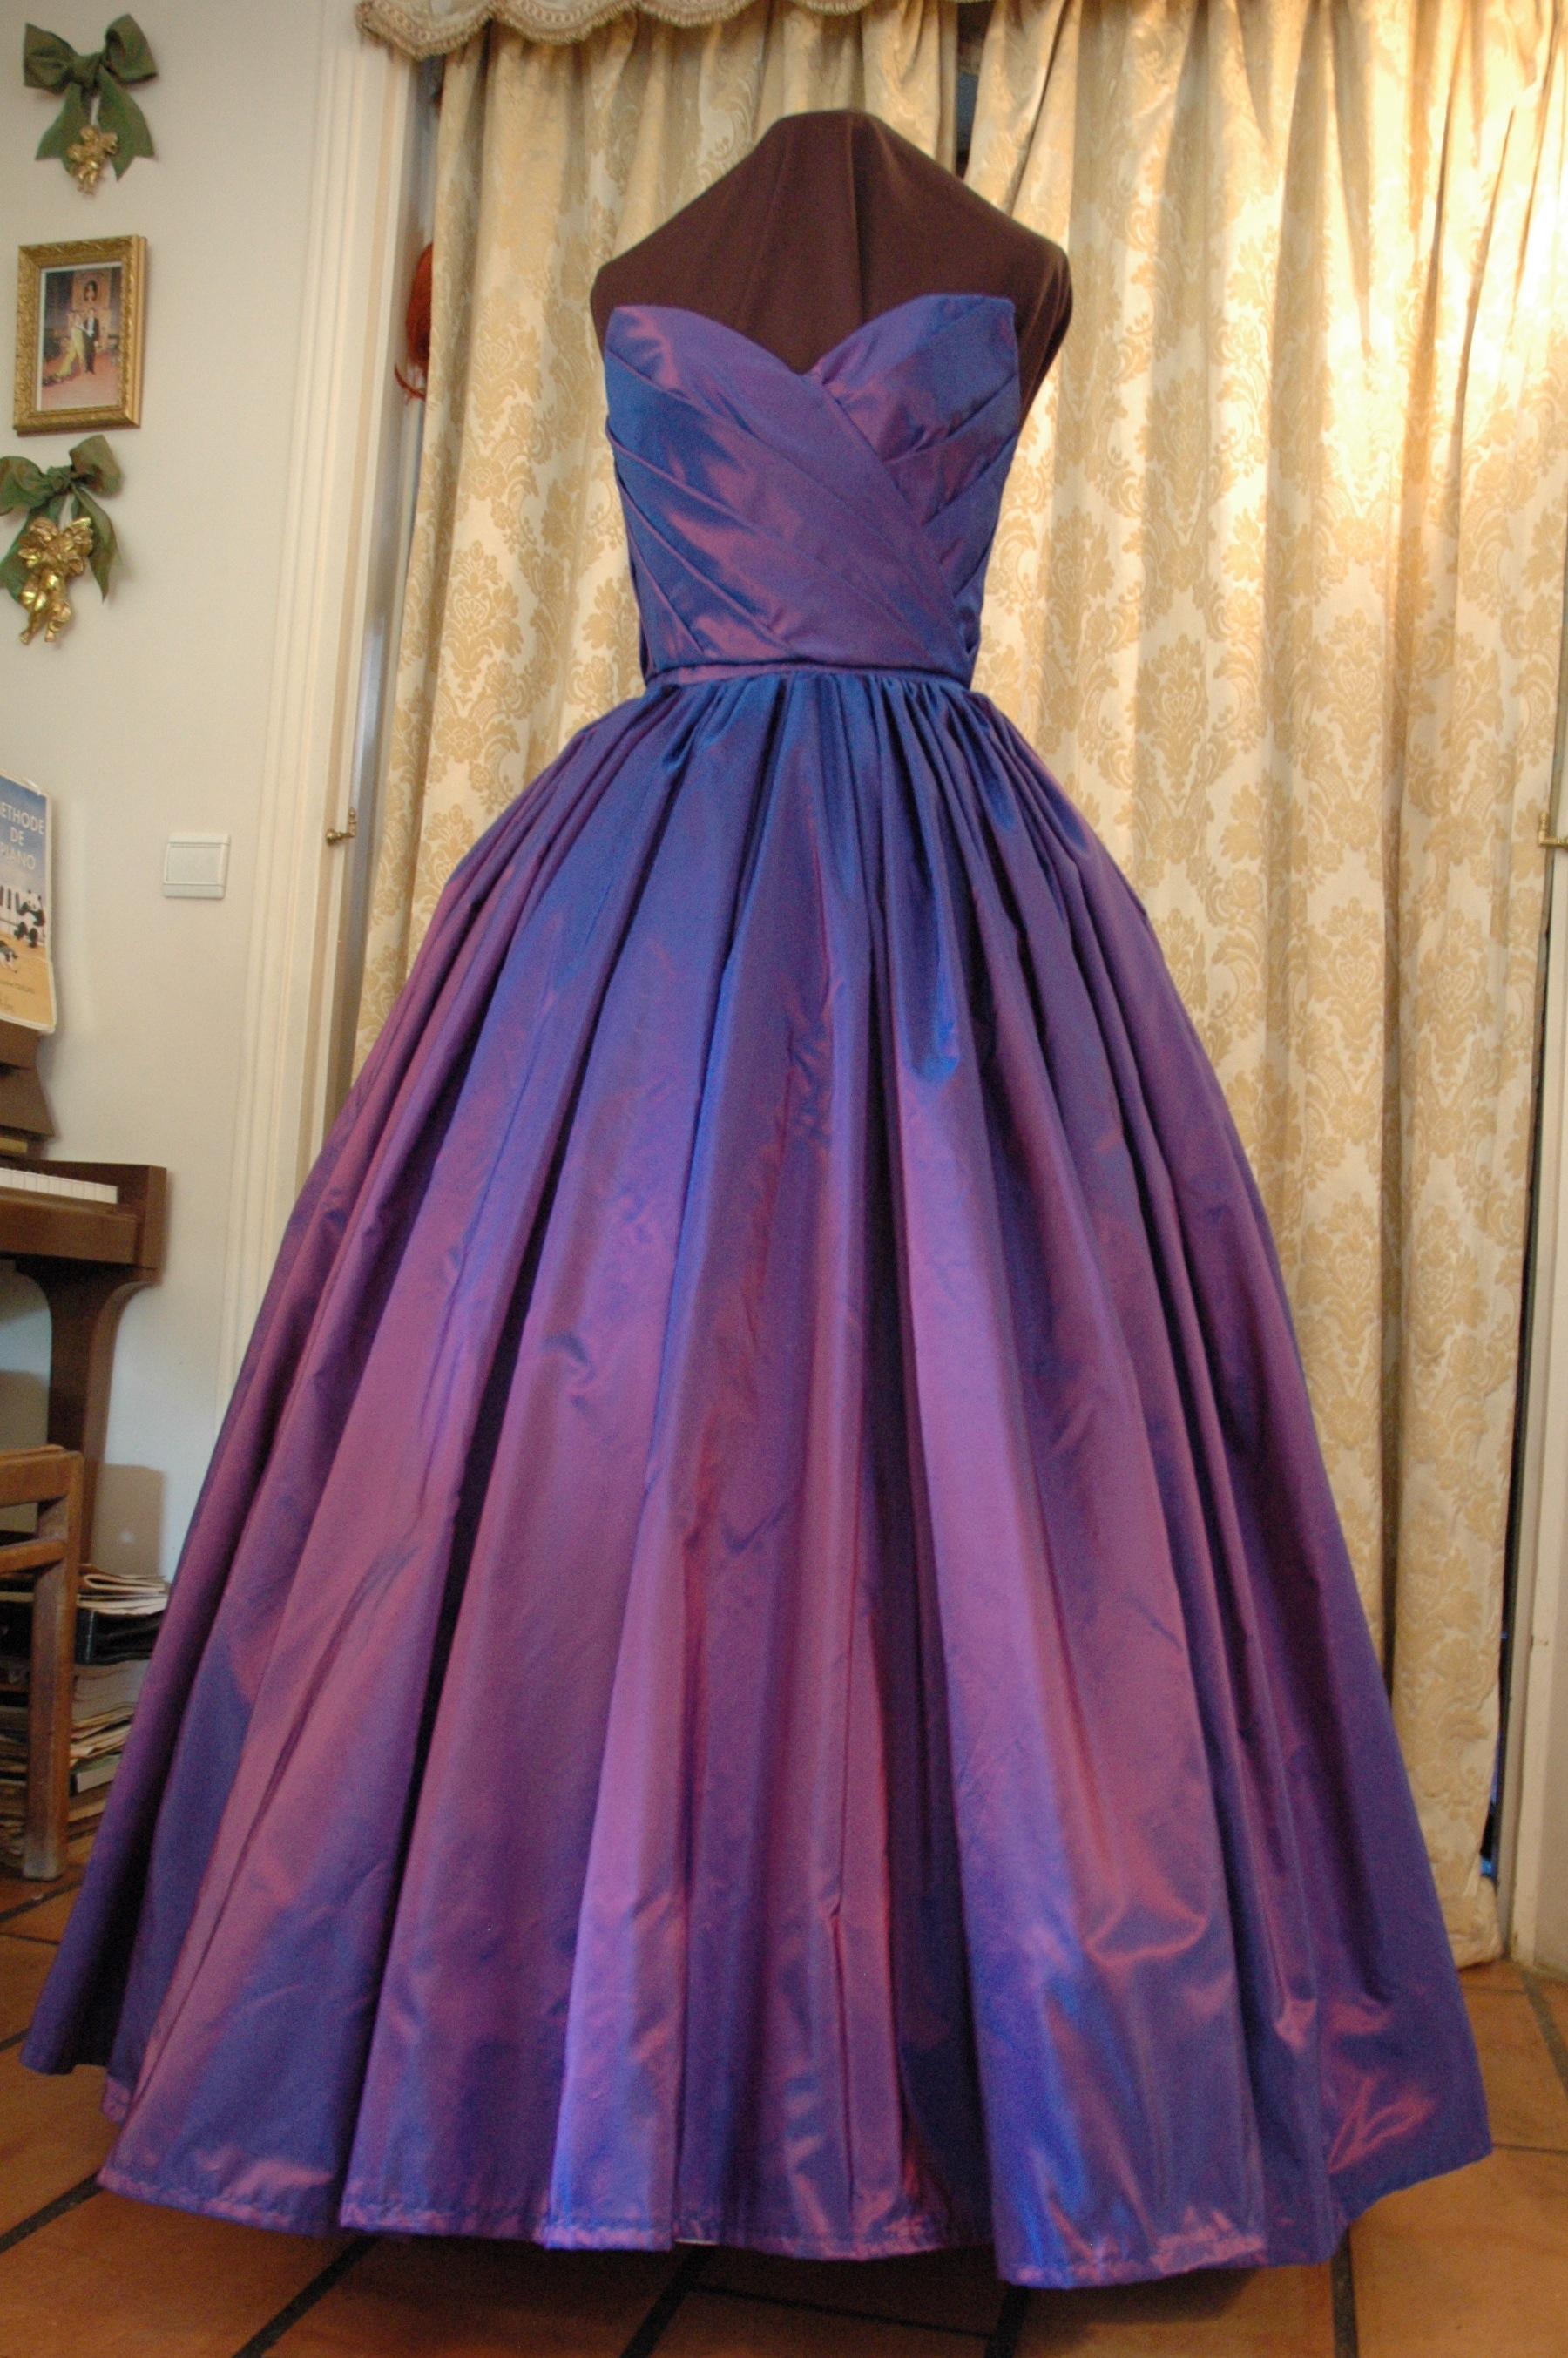 Robe du soir en taffetas changeant violet rose style 1950